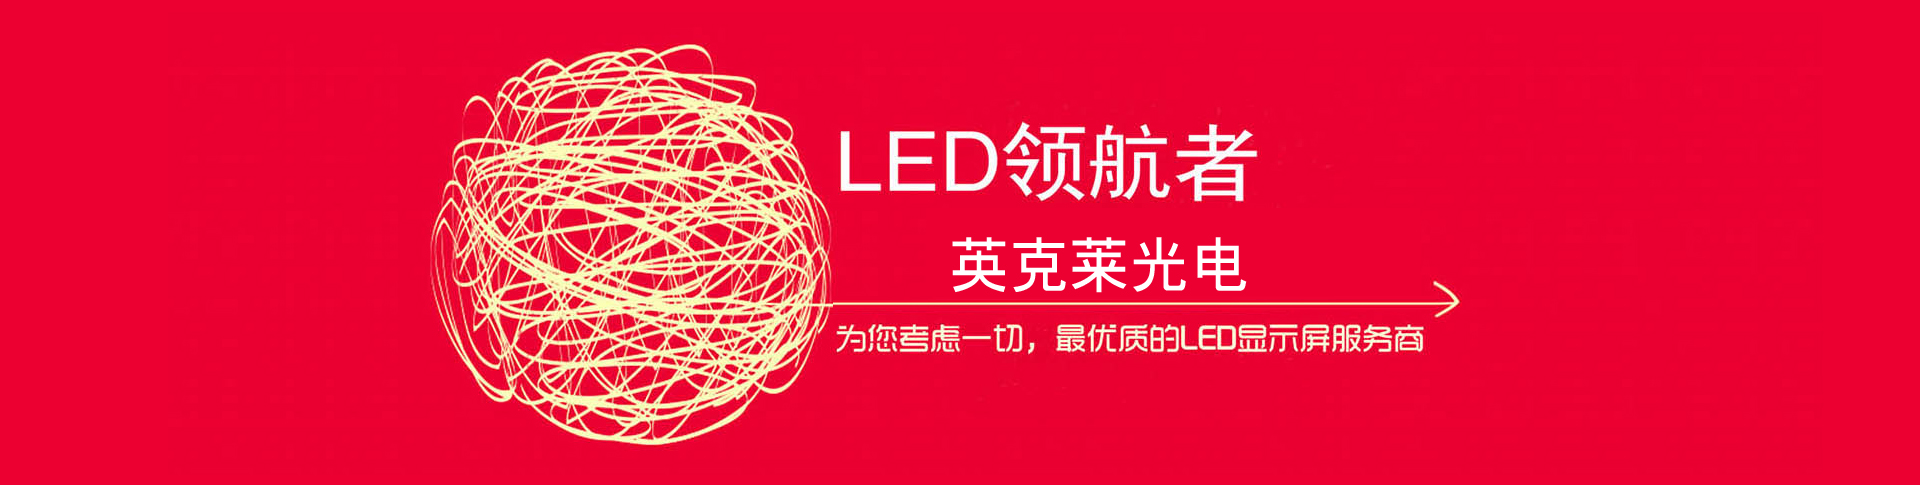 山东LED路灯